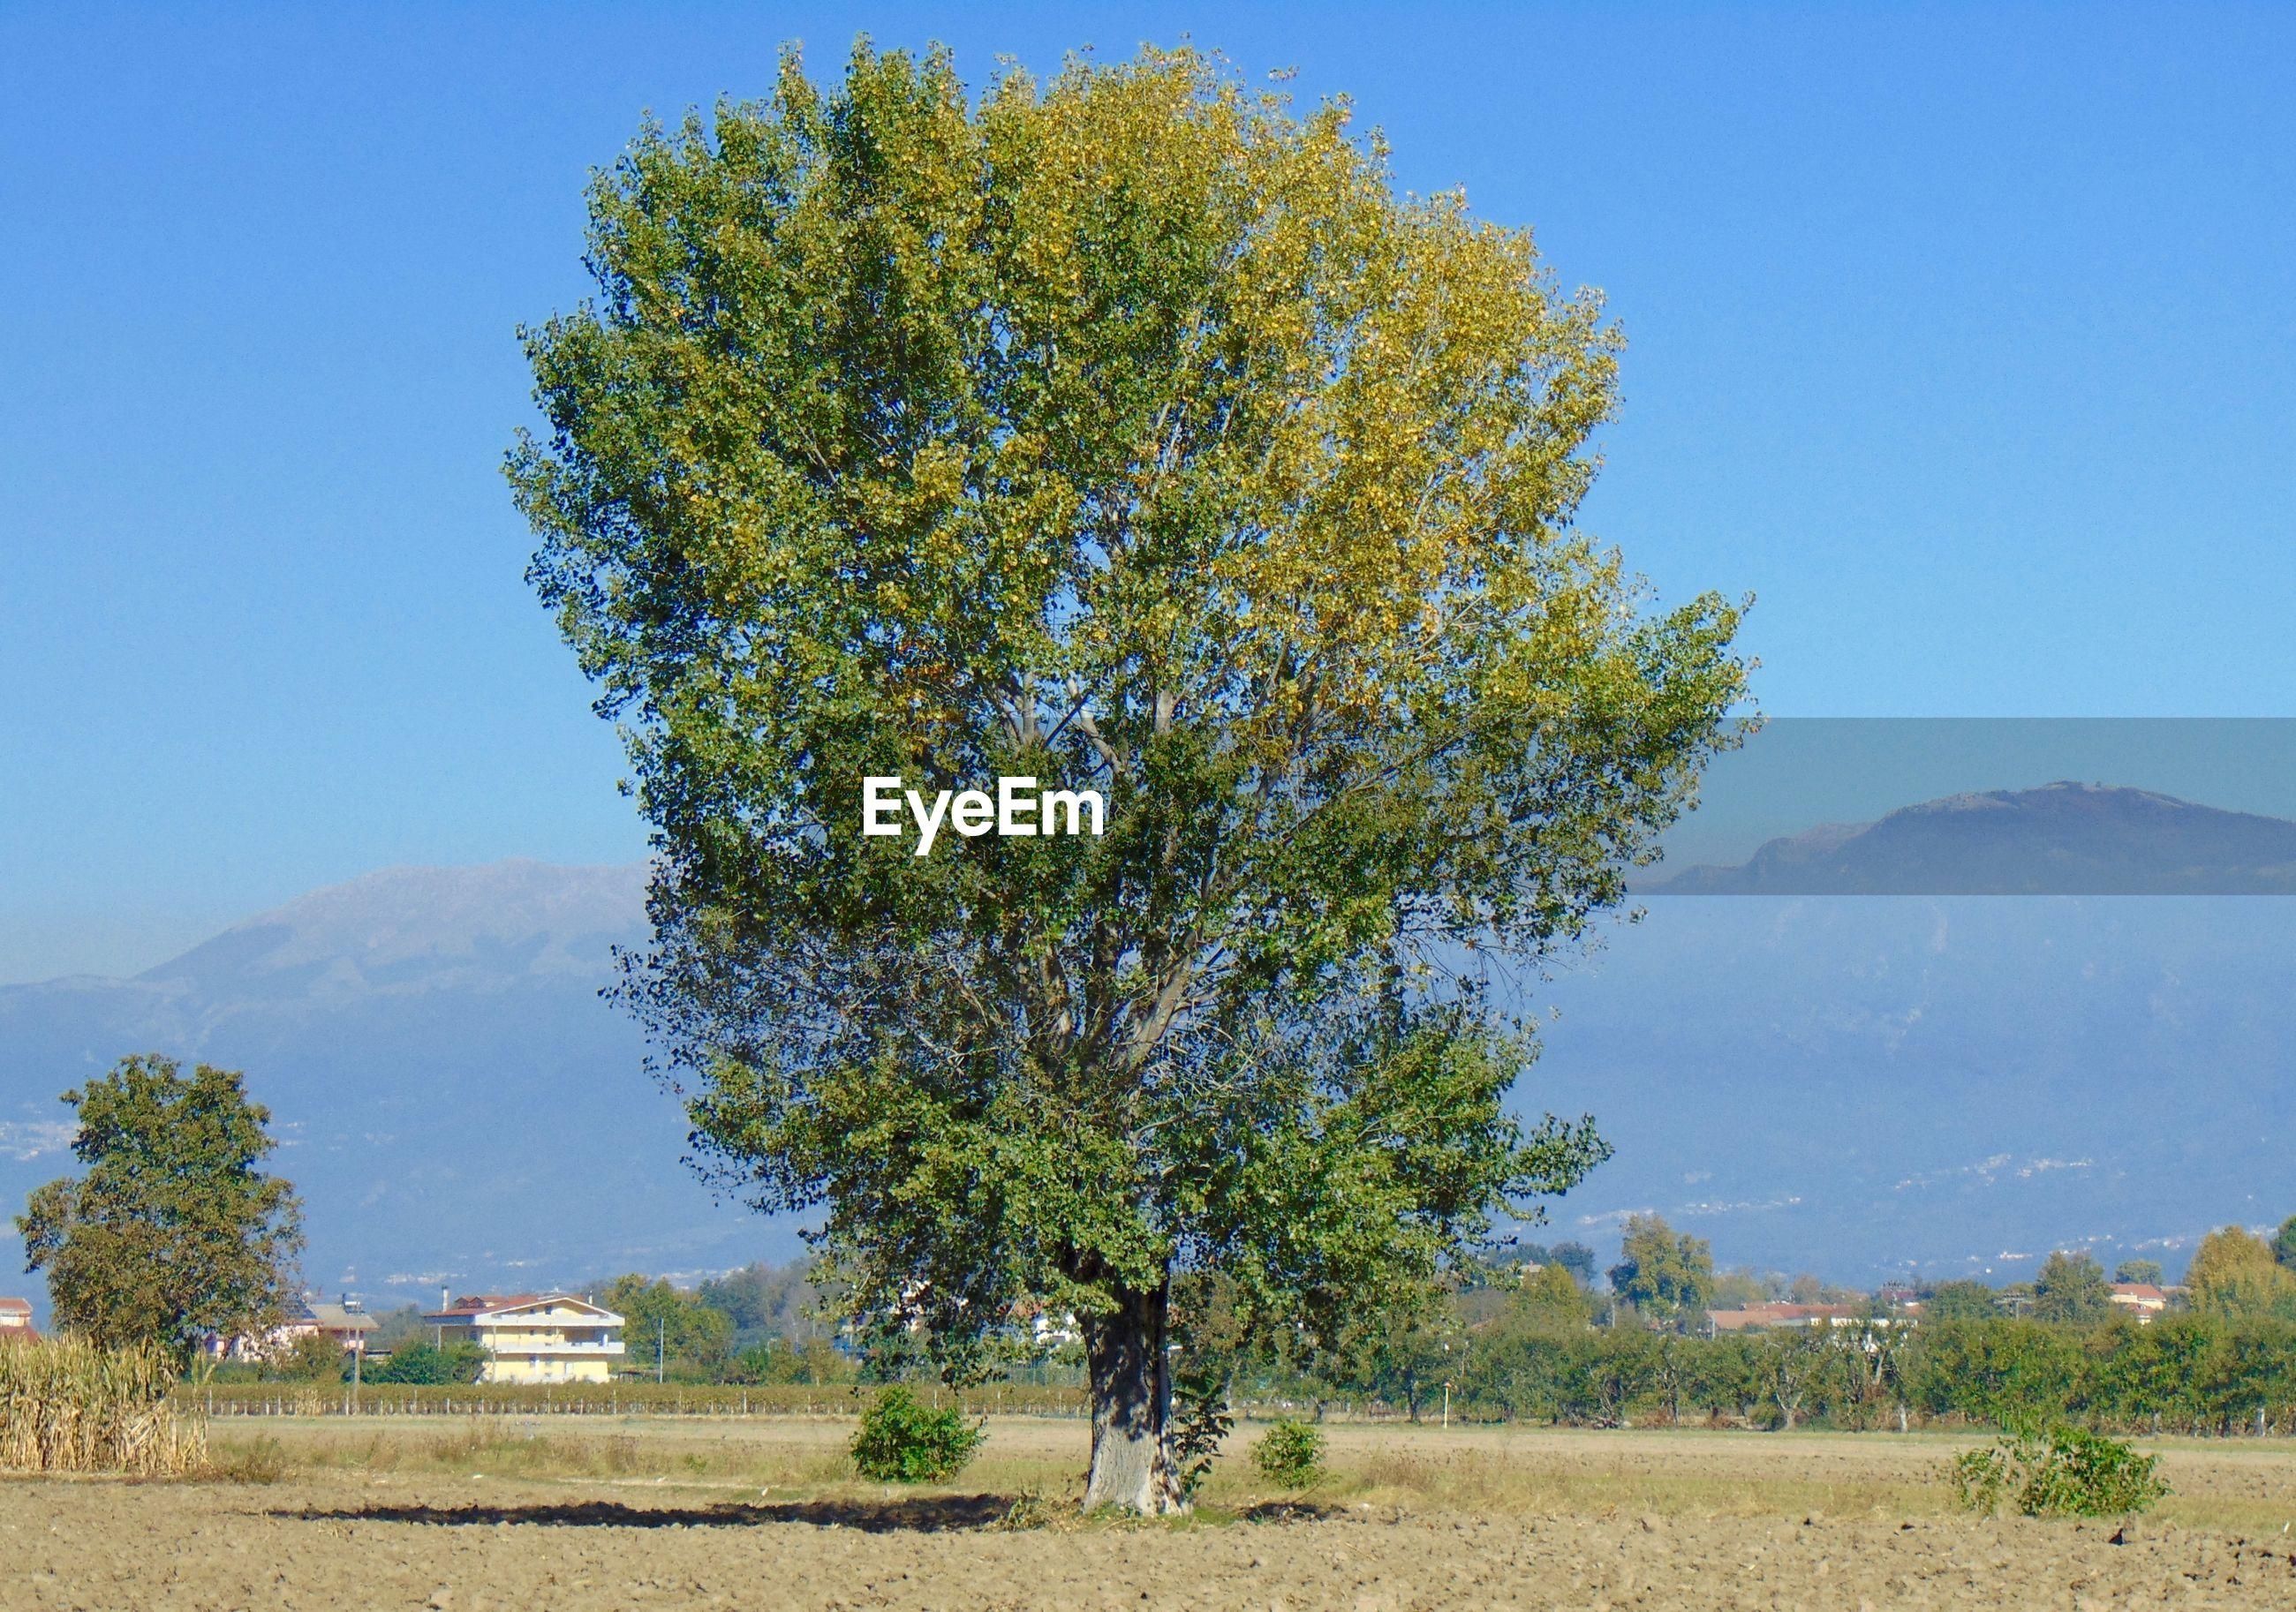 TREE IN FIELD AGAINST CLEAR SKY